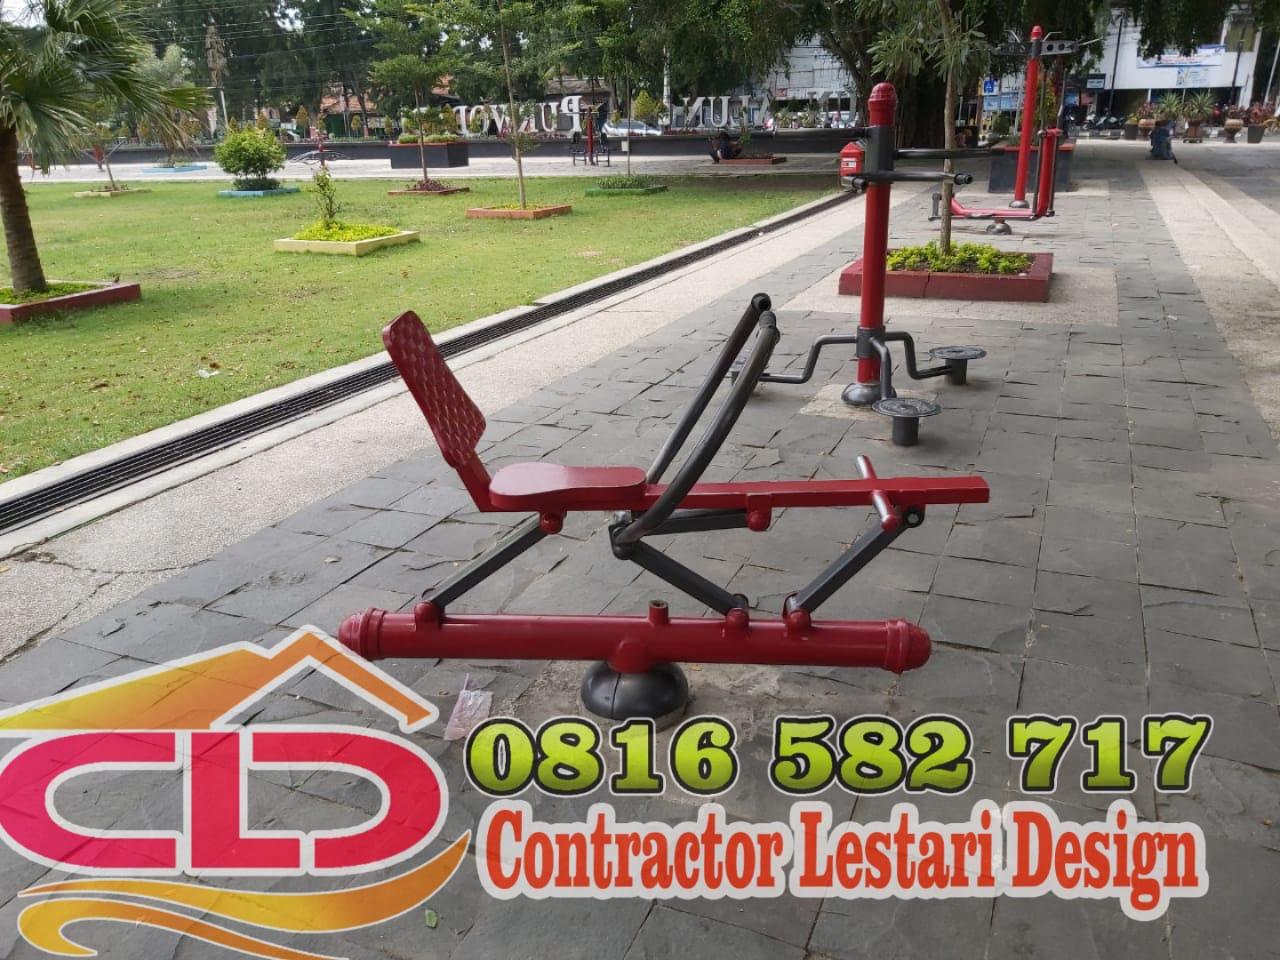 spesial alat fitnes outdoor,spesialis alat fitnes taman,produksi alat fitnes taman